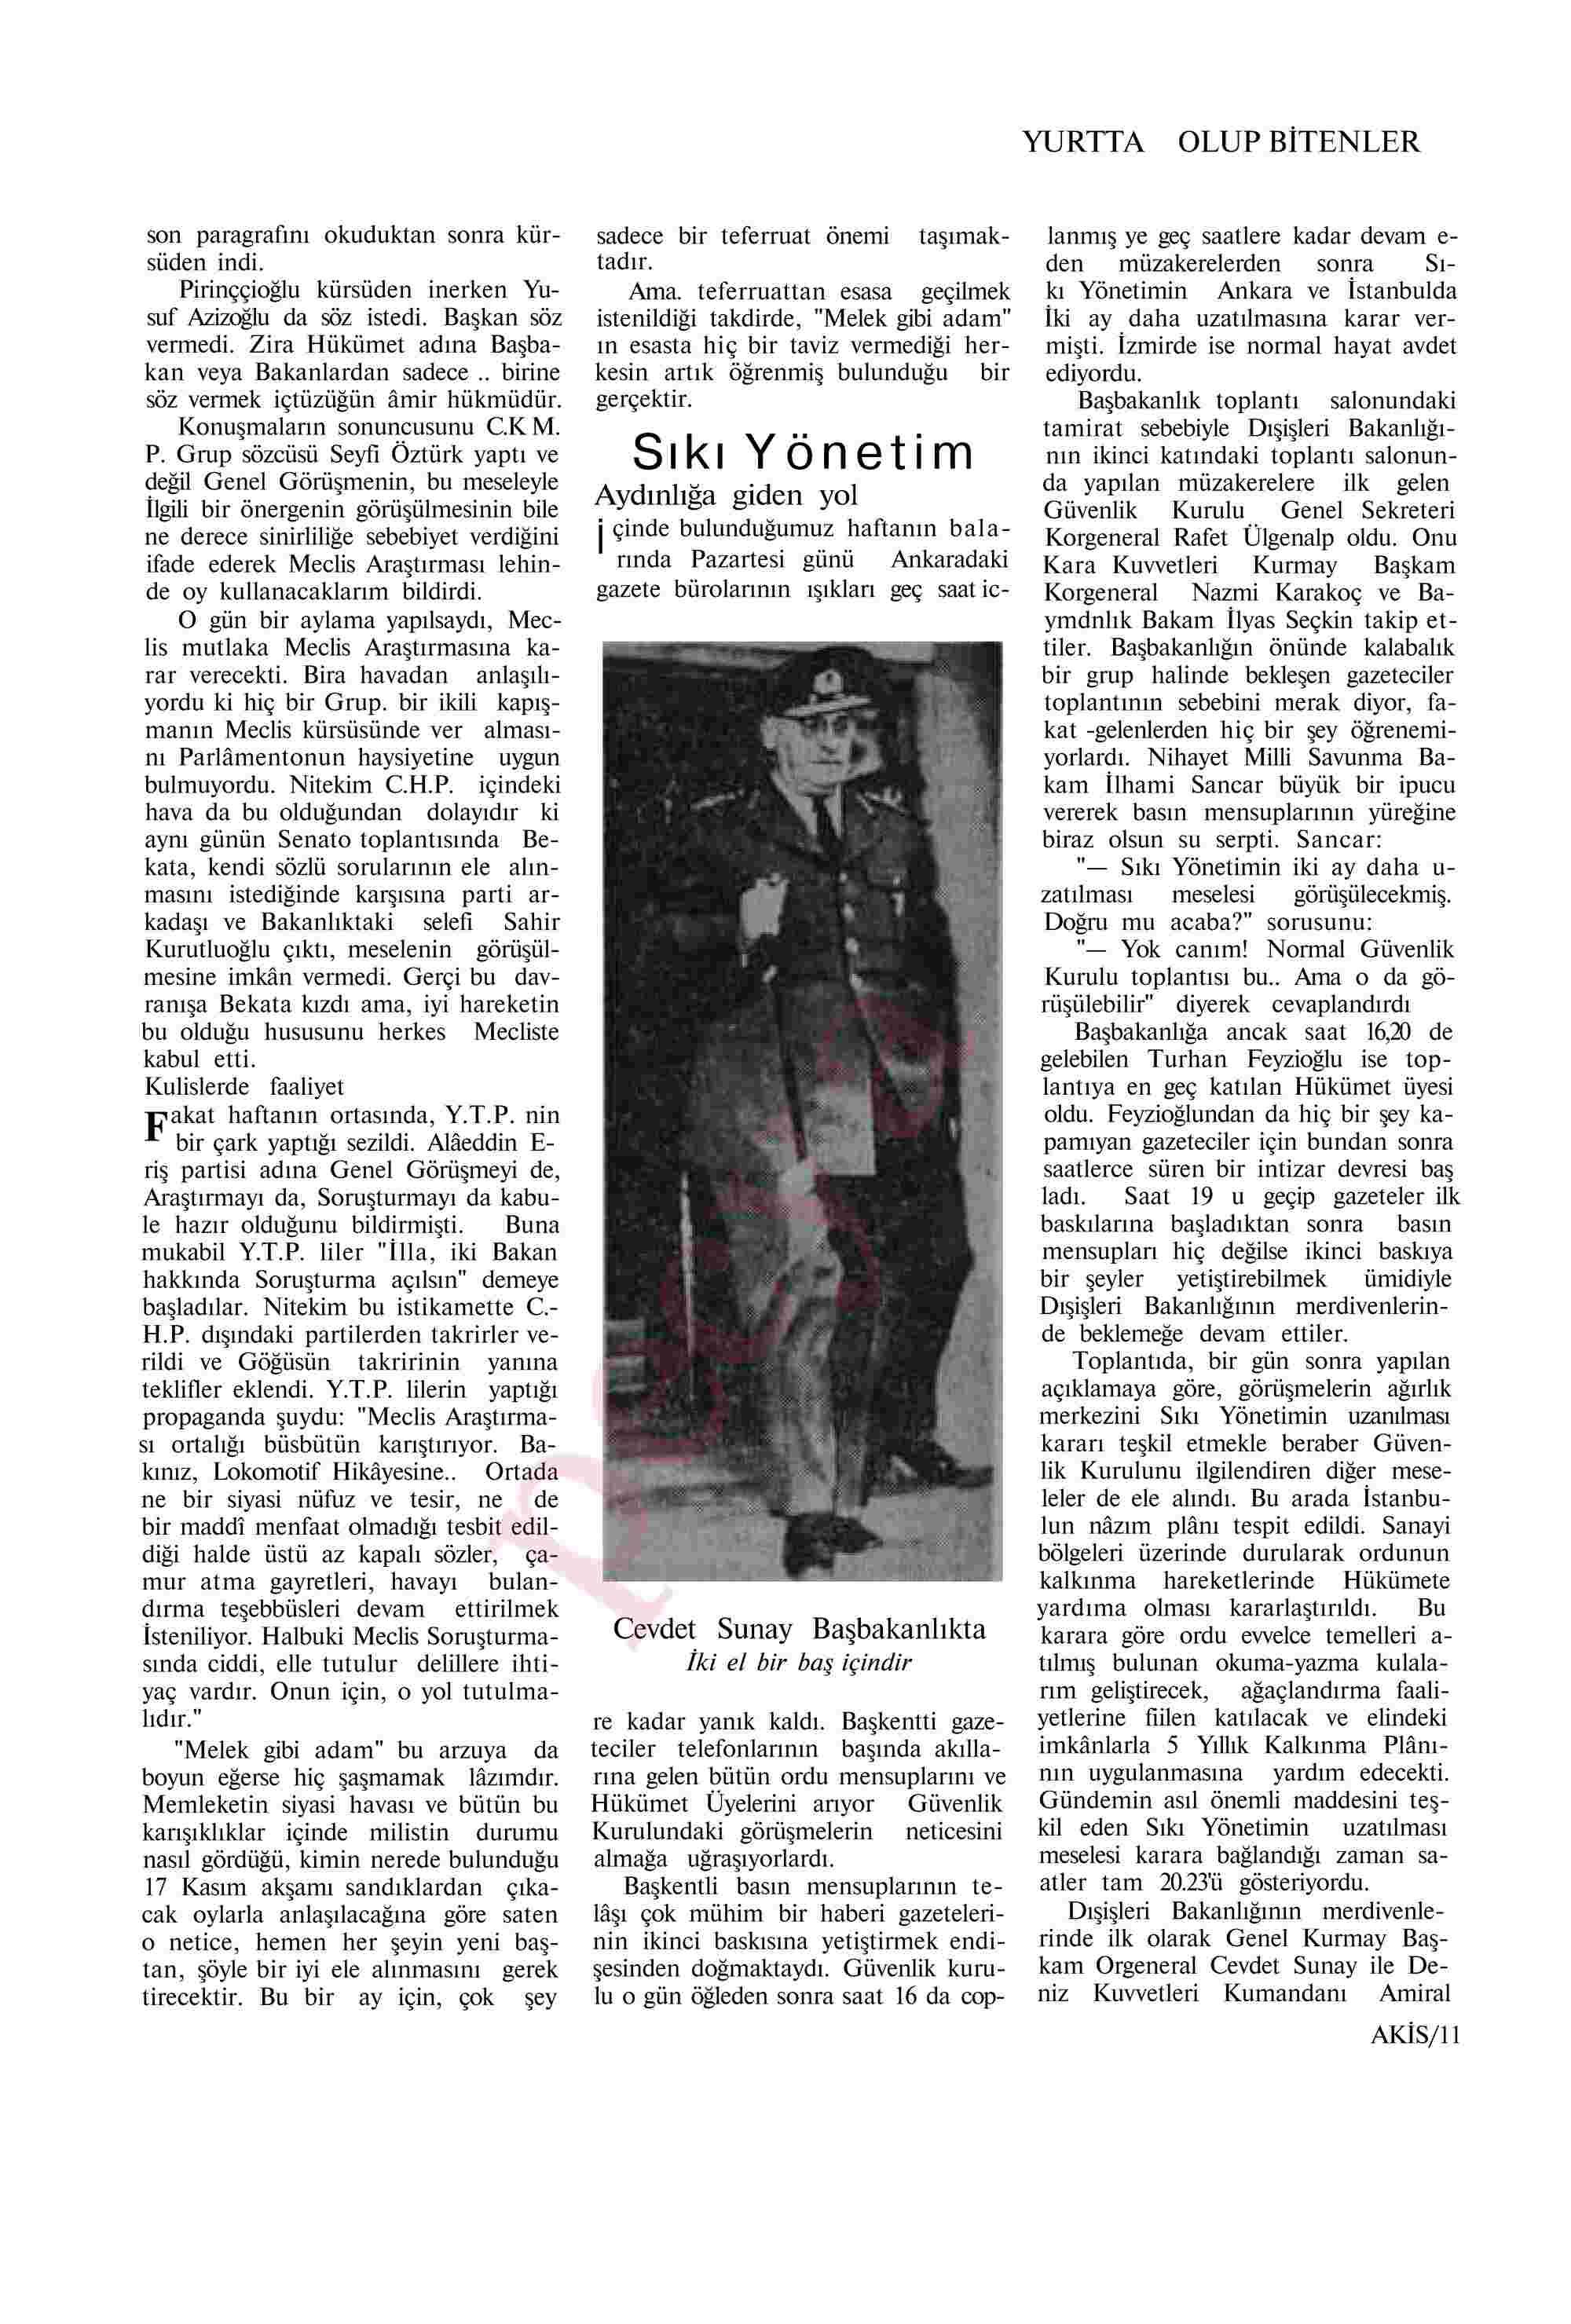 19 Ekim 1963 Tarihli Akis Dergisi Sayfa 11